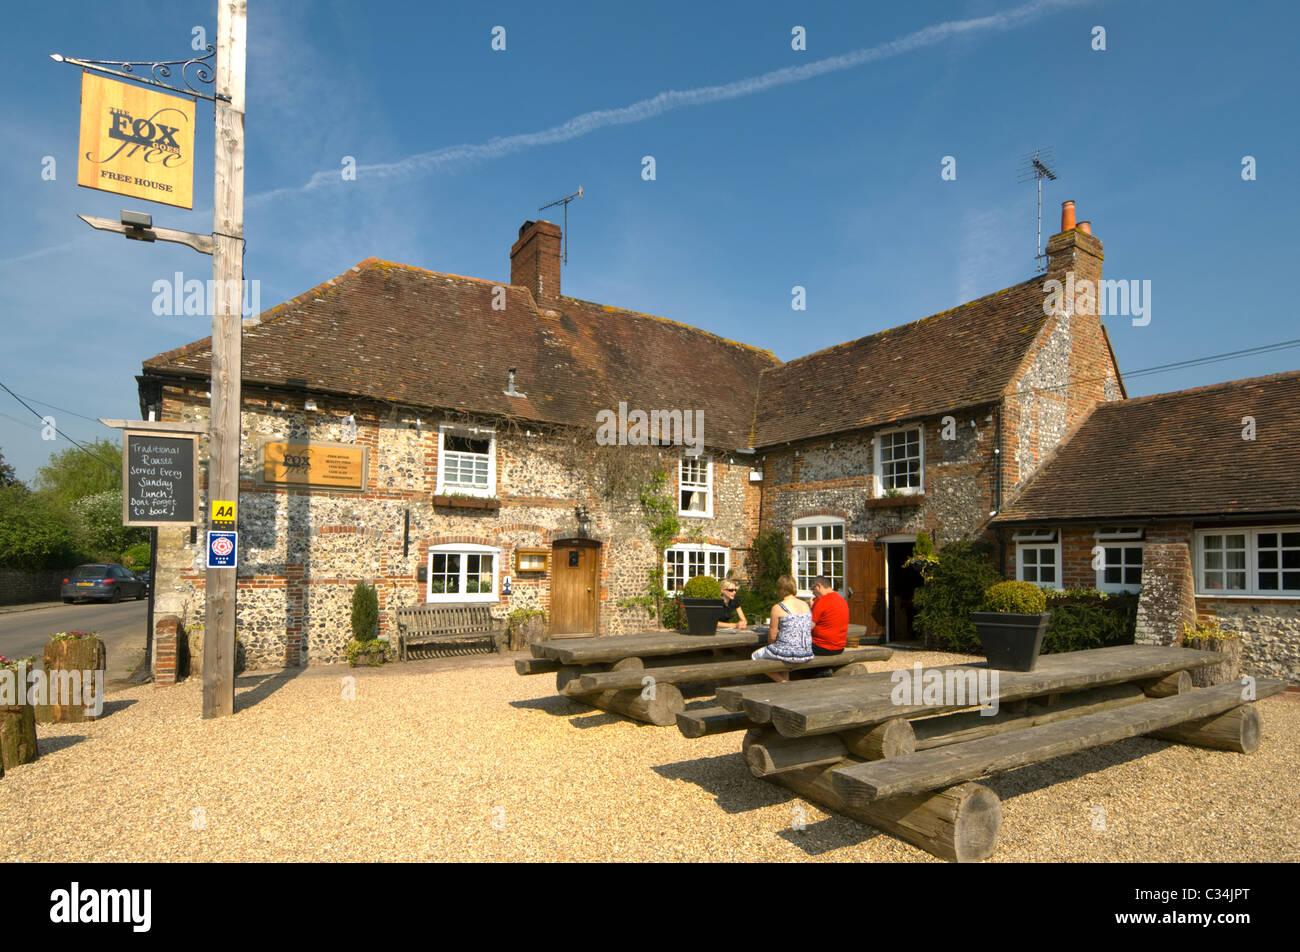 The Fox goes Free Pub Singleton West Sussex UK - Stock Image